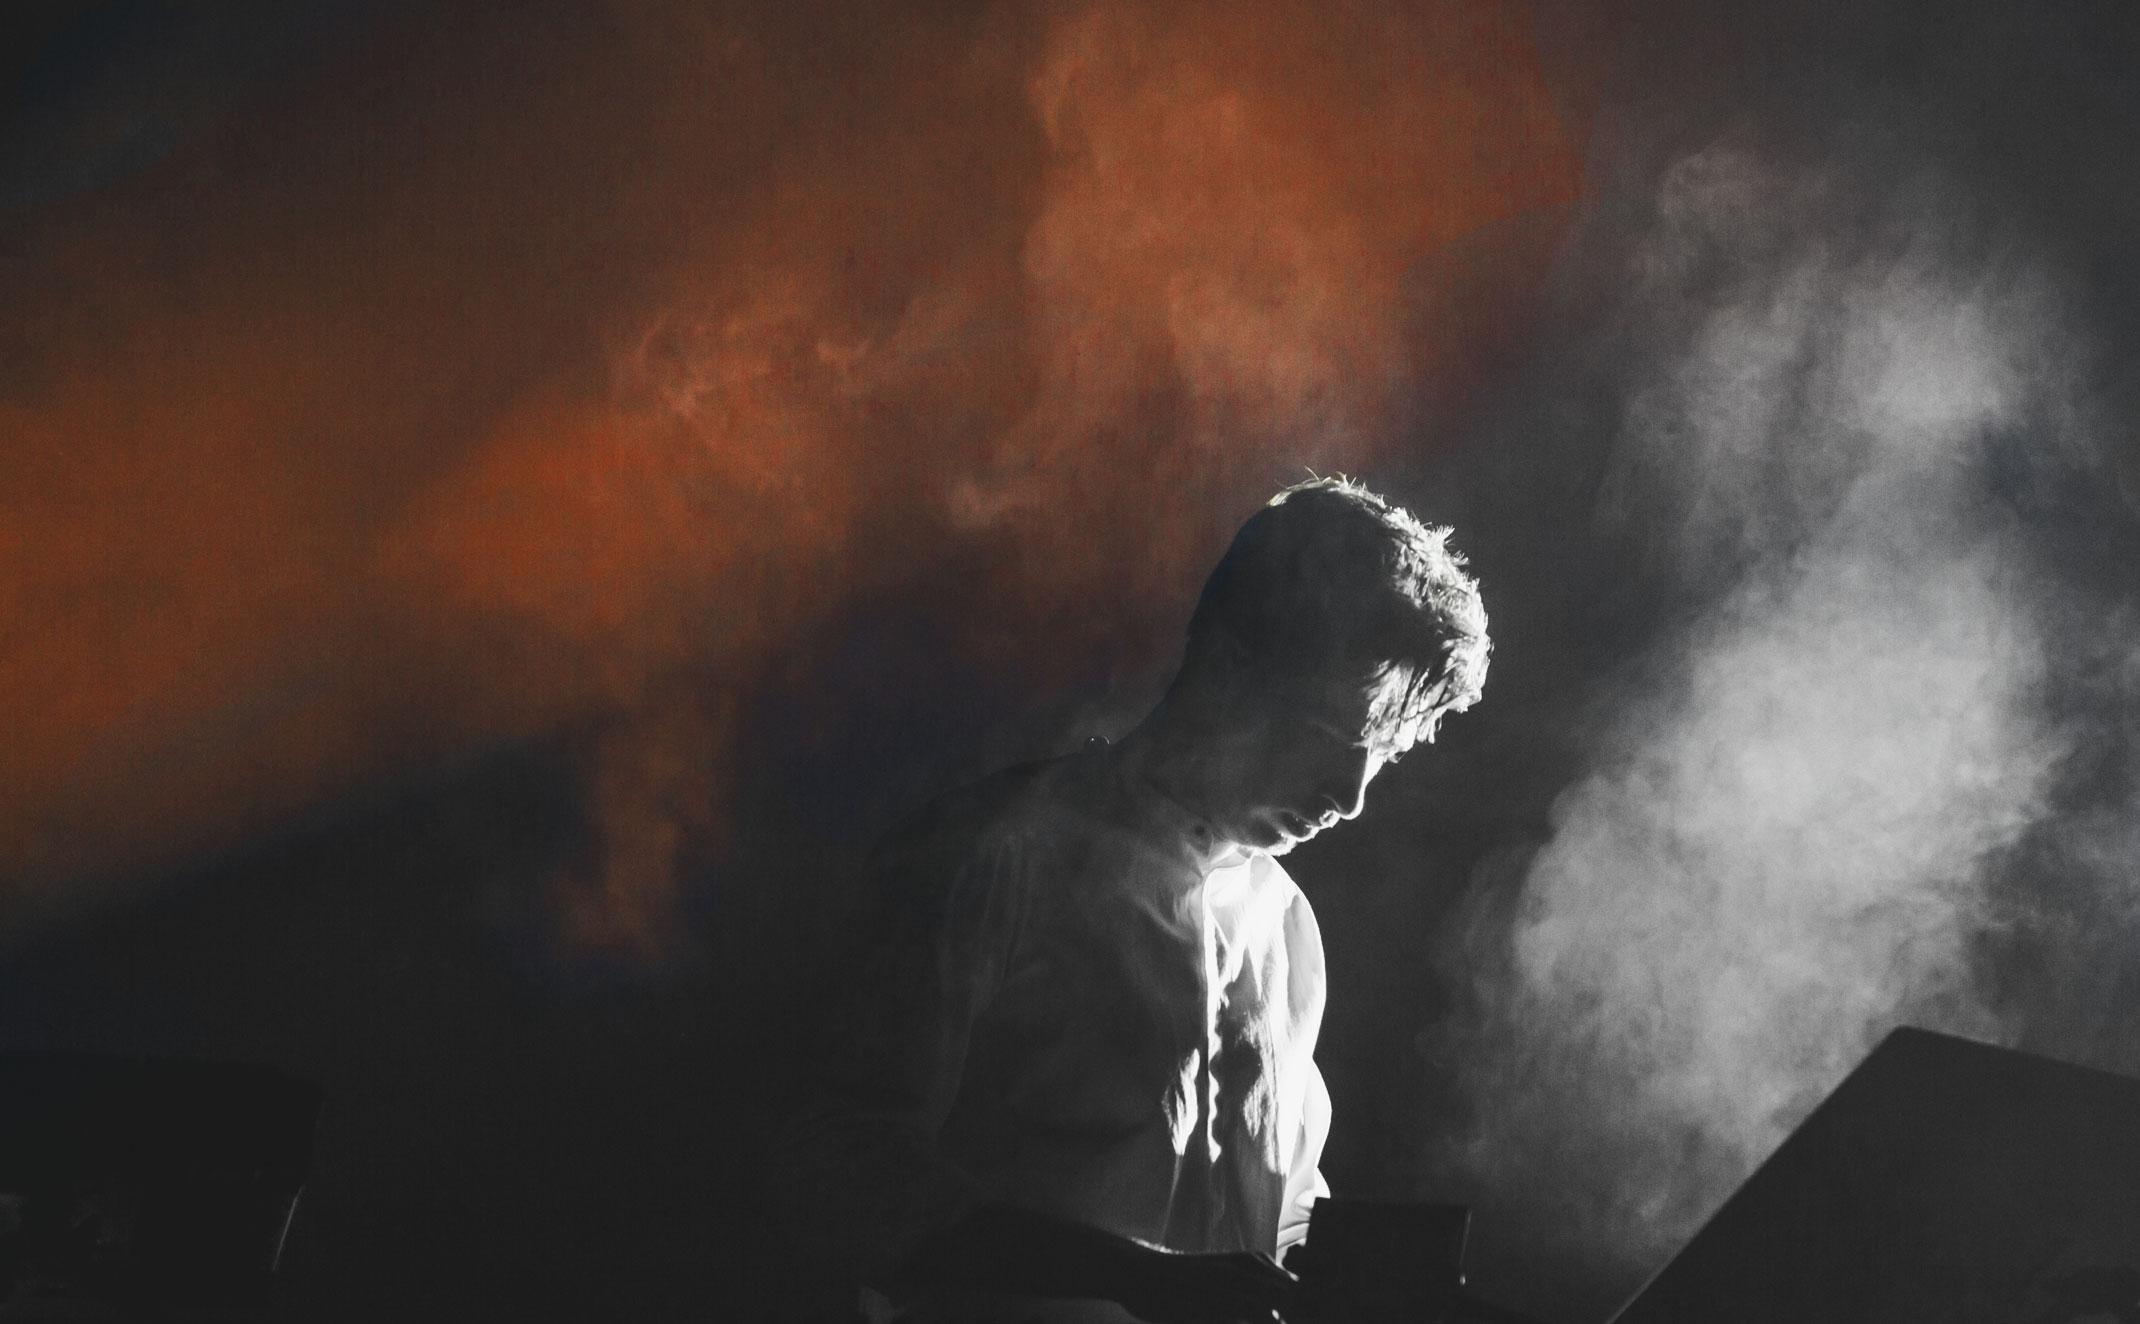 Musico | AI generative music